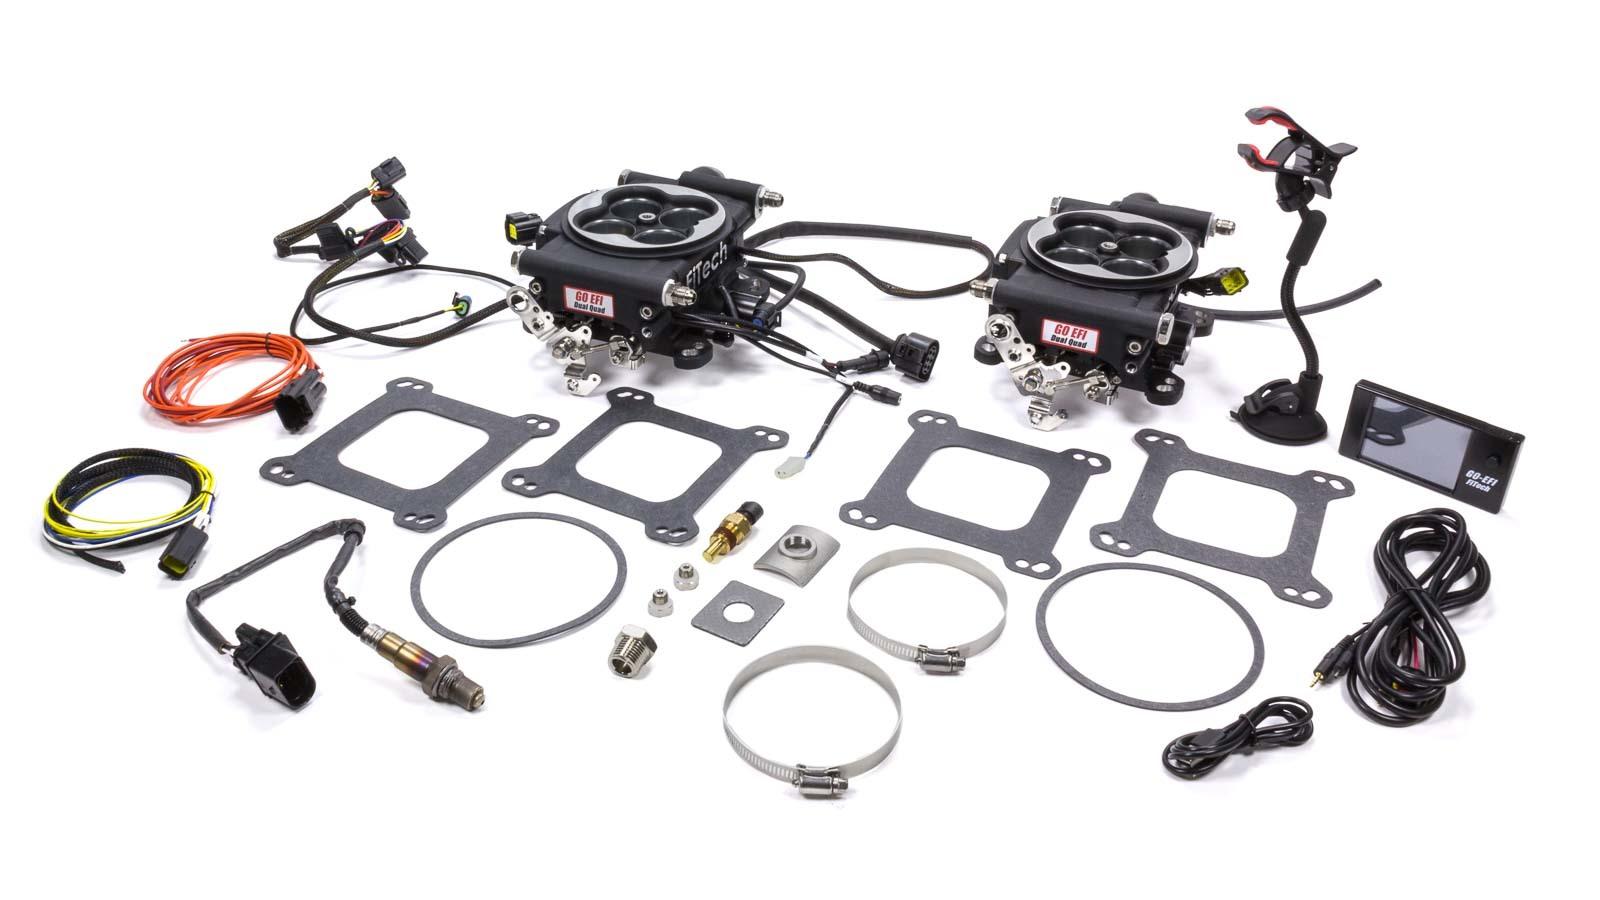 Fitech Fuel Injection 30062 Fuel Injection, Go EFI 2x4, Throttle Body, Square Bore, 70 lb/hr Injectors, Aluminum, Black Anodize, Universal, Kit